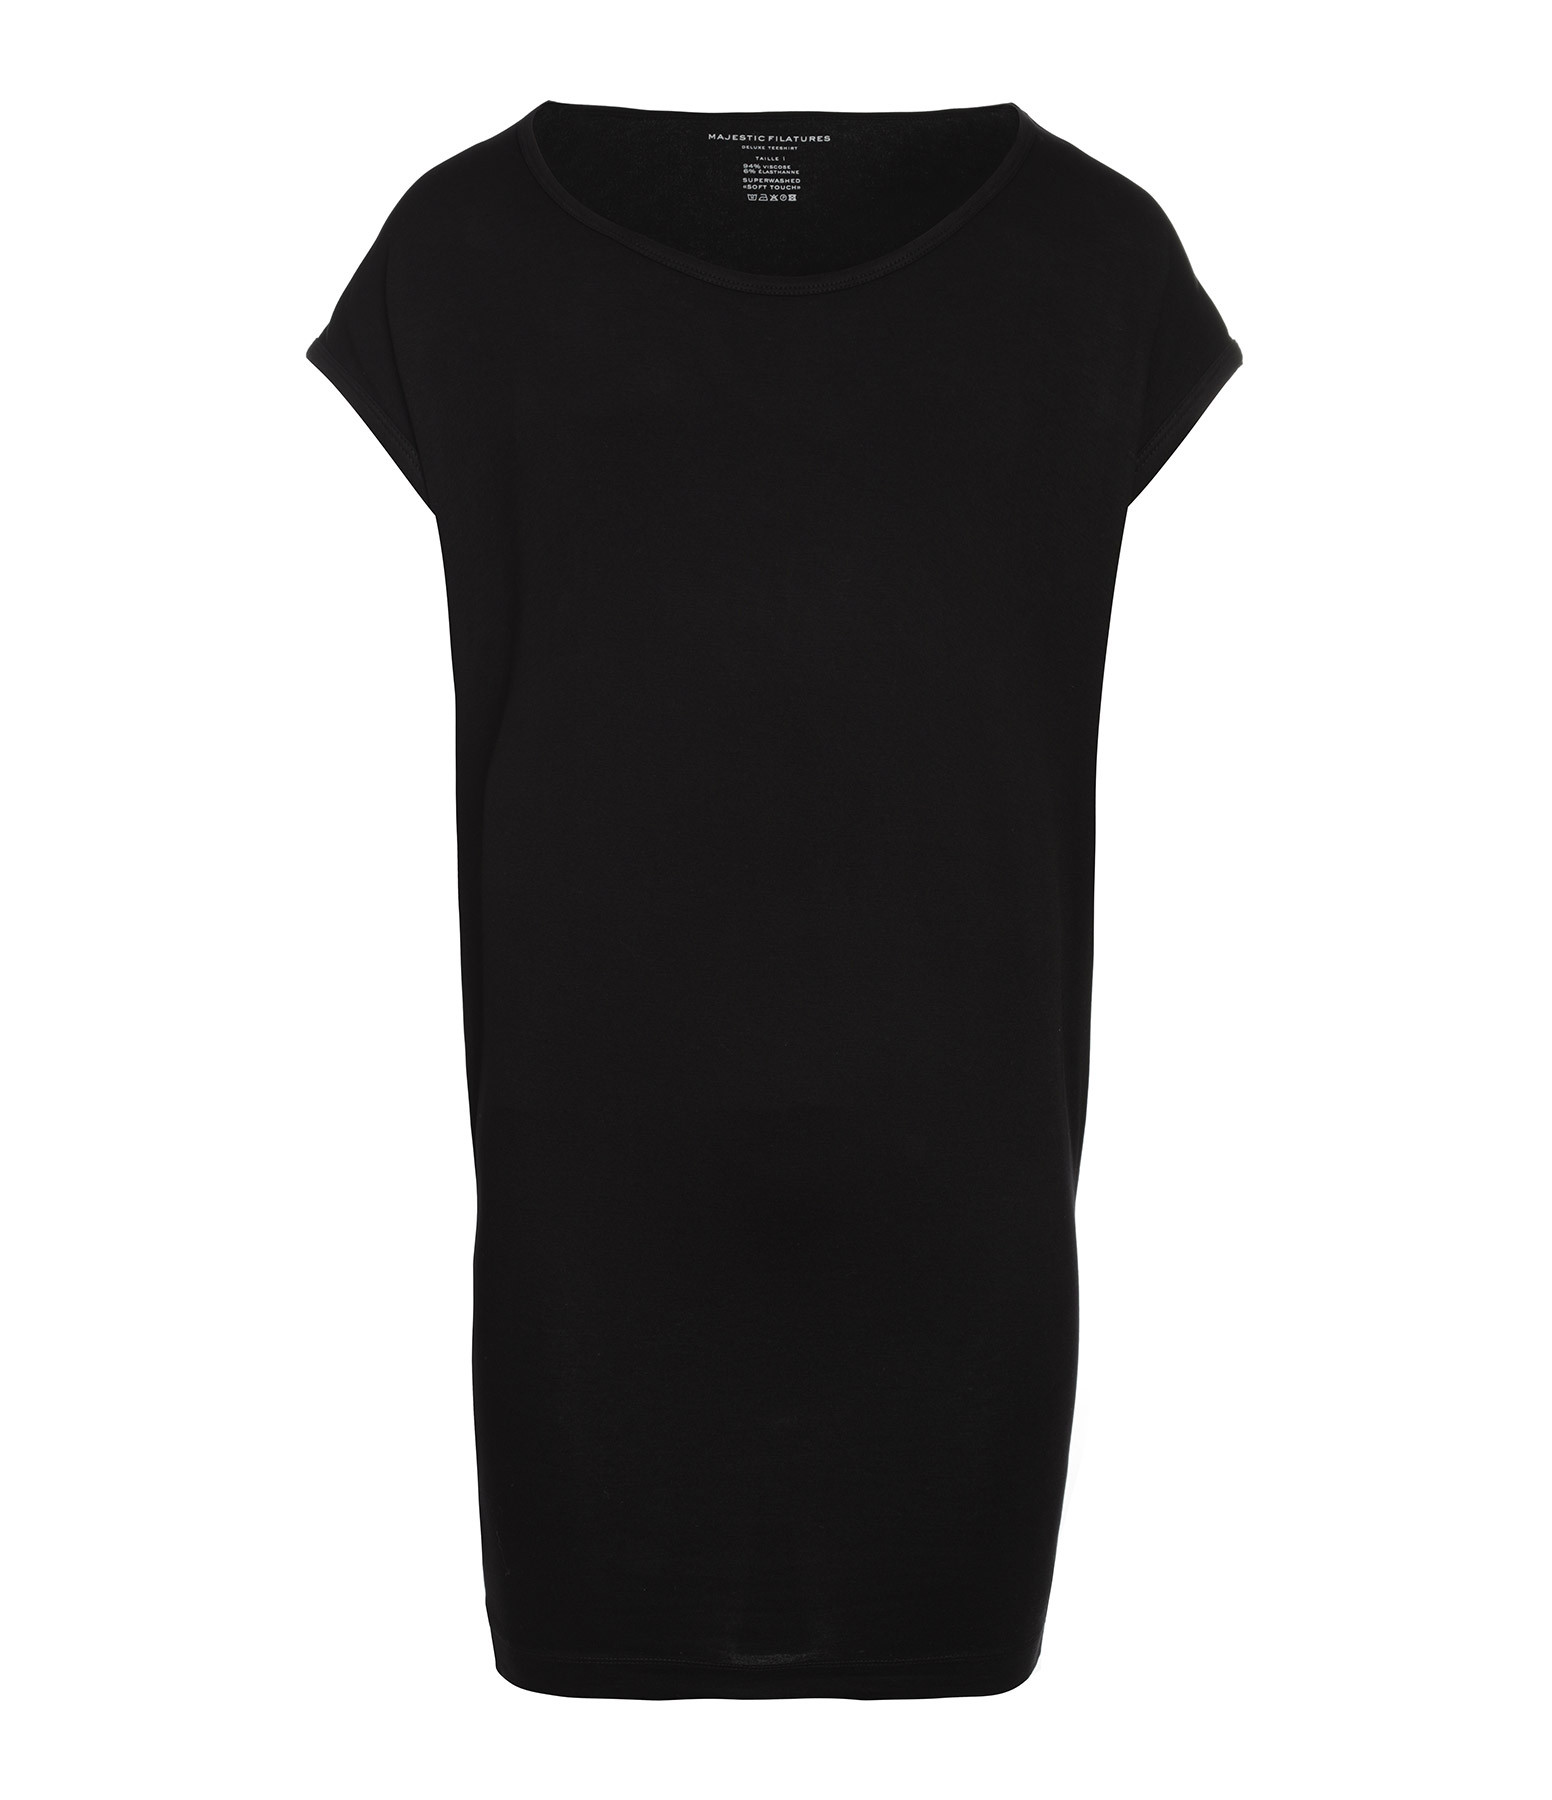 MAJESTIC FILATURES - Robe Col Rond Noir